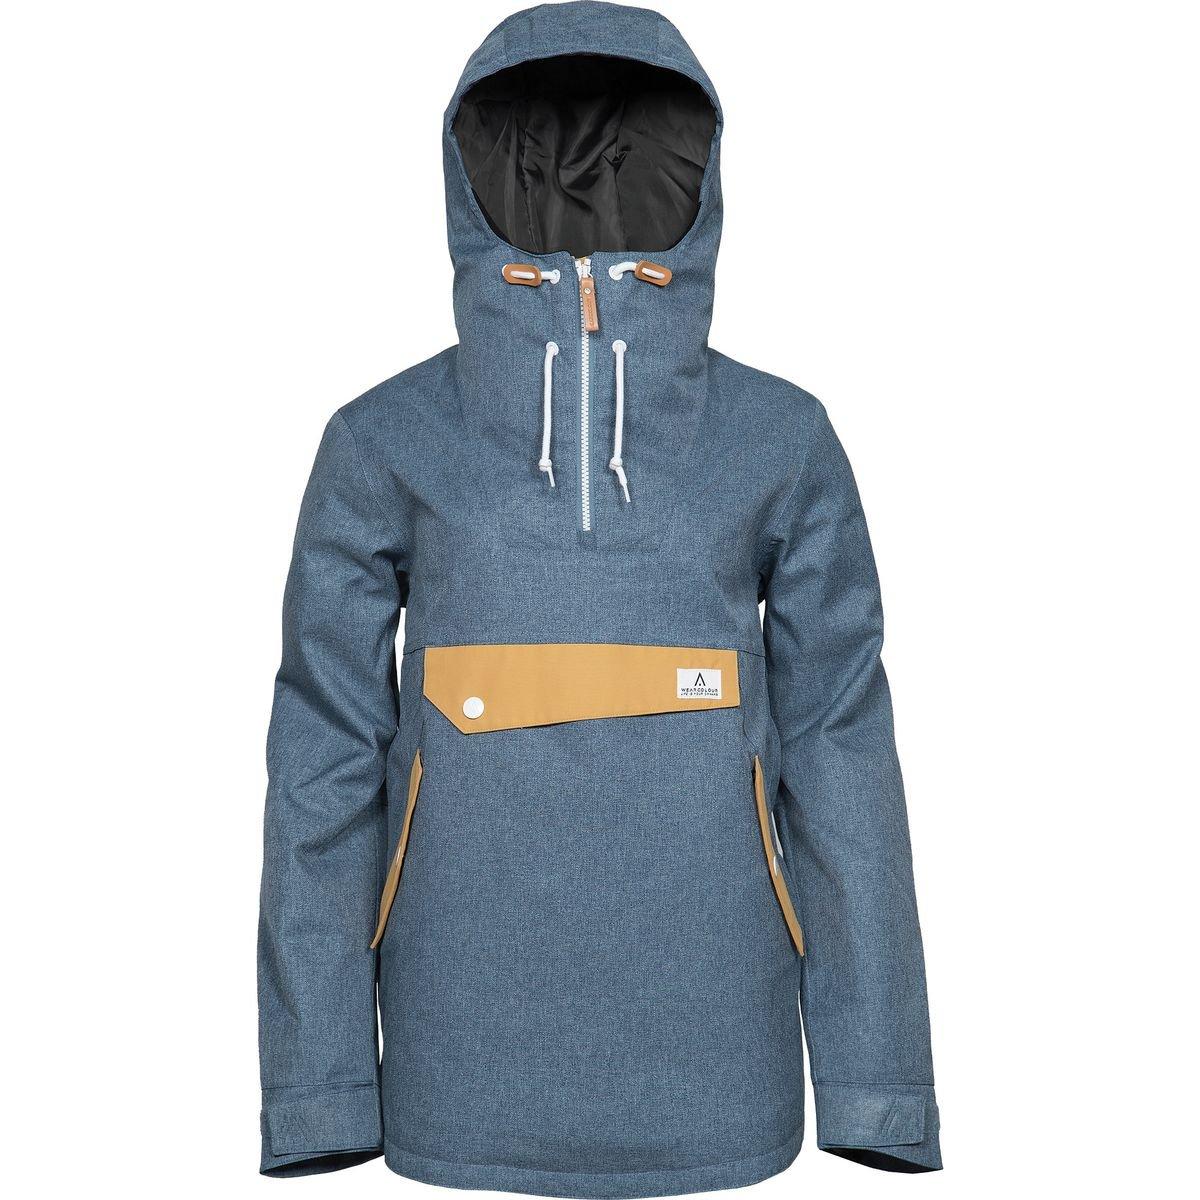 Wear Colour Recruit Anorak Jacket – Women 's B0772WJ3DG  デニムブルー Large